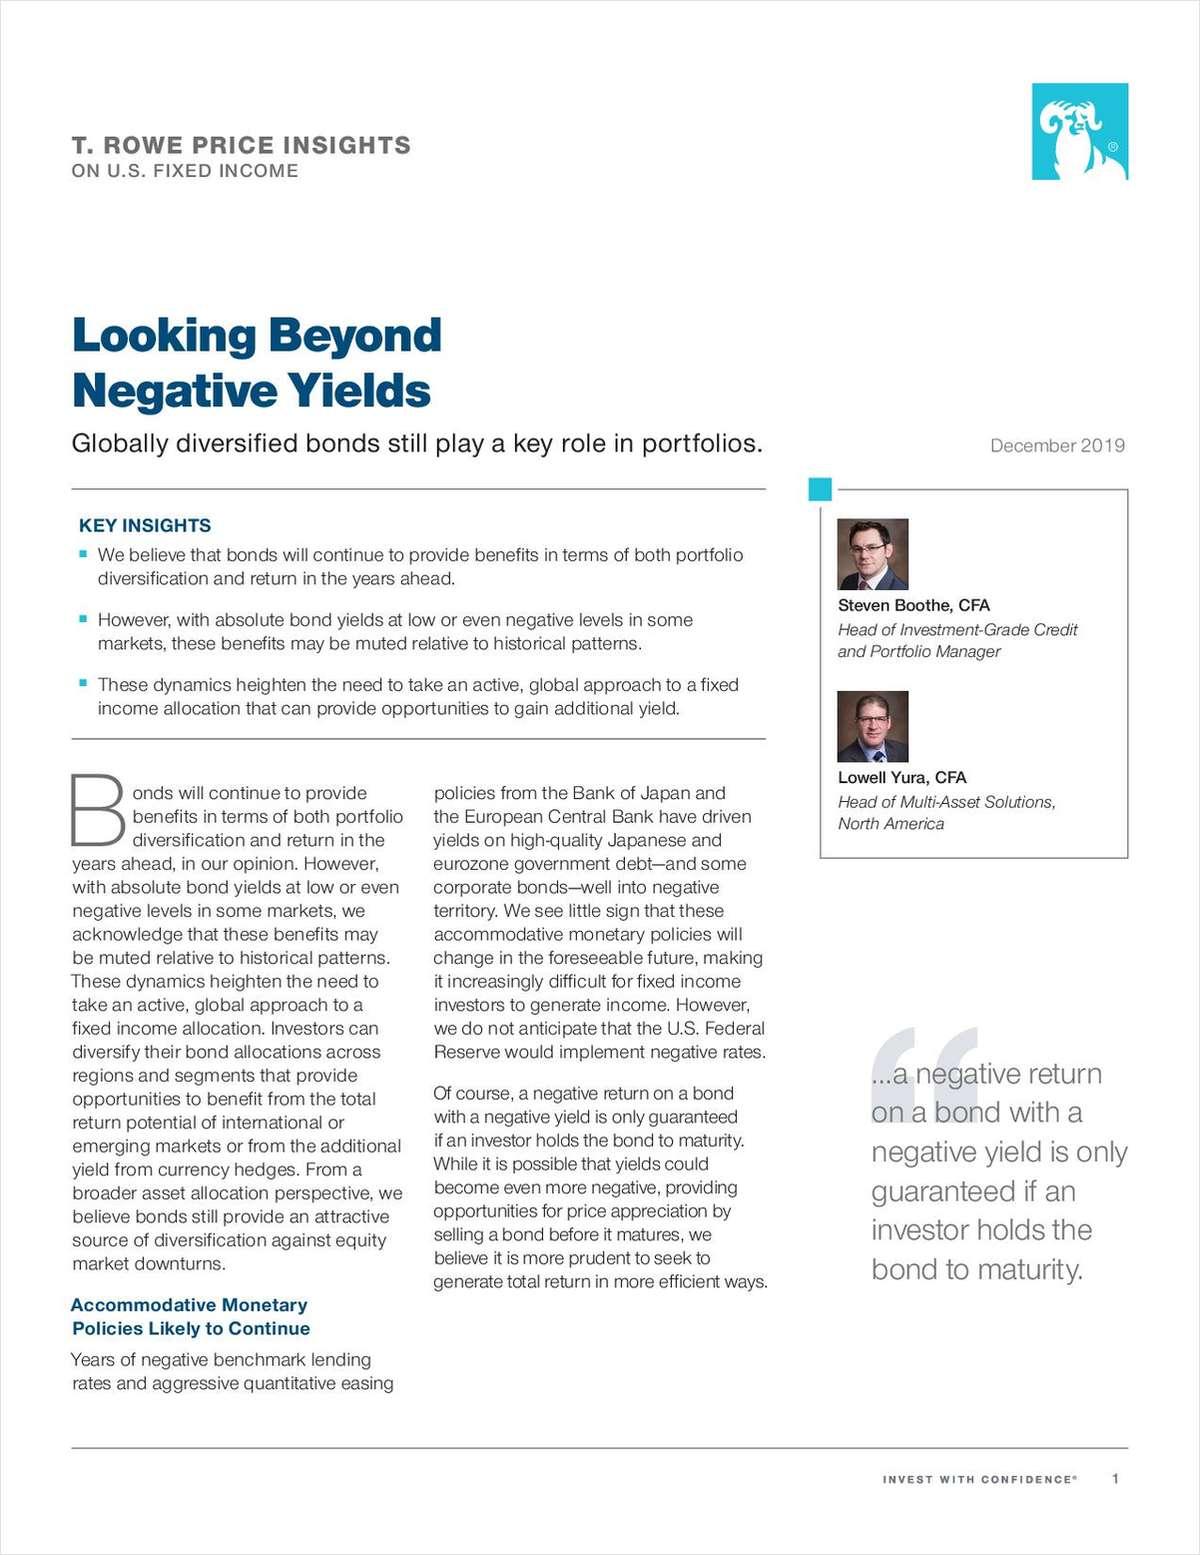 Looking Beyond Negative Yields